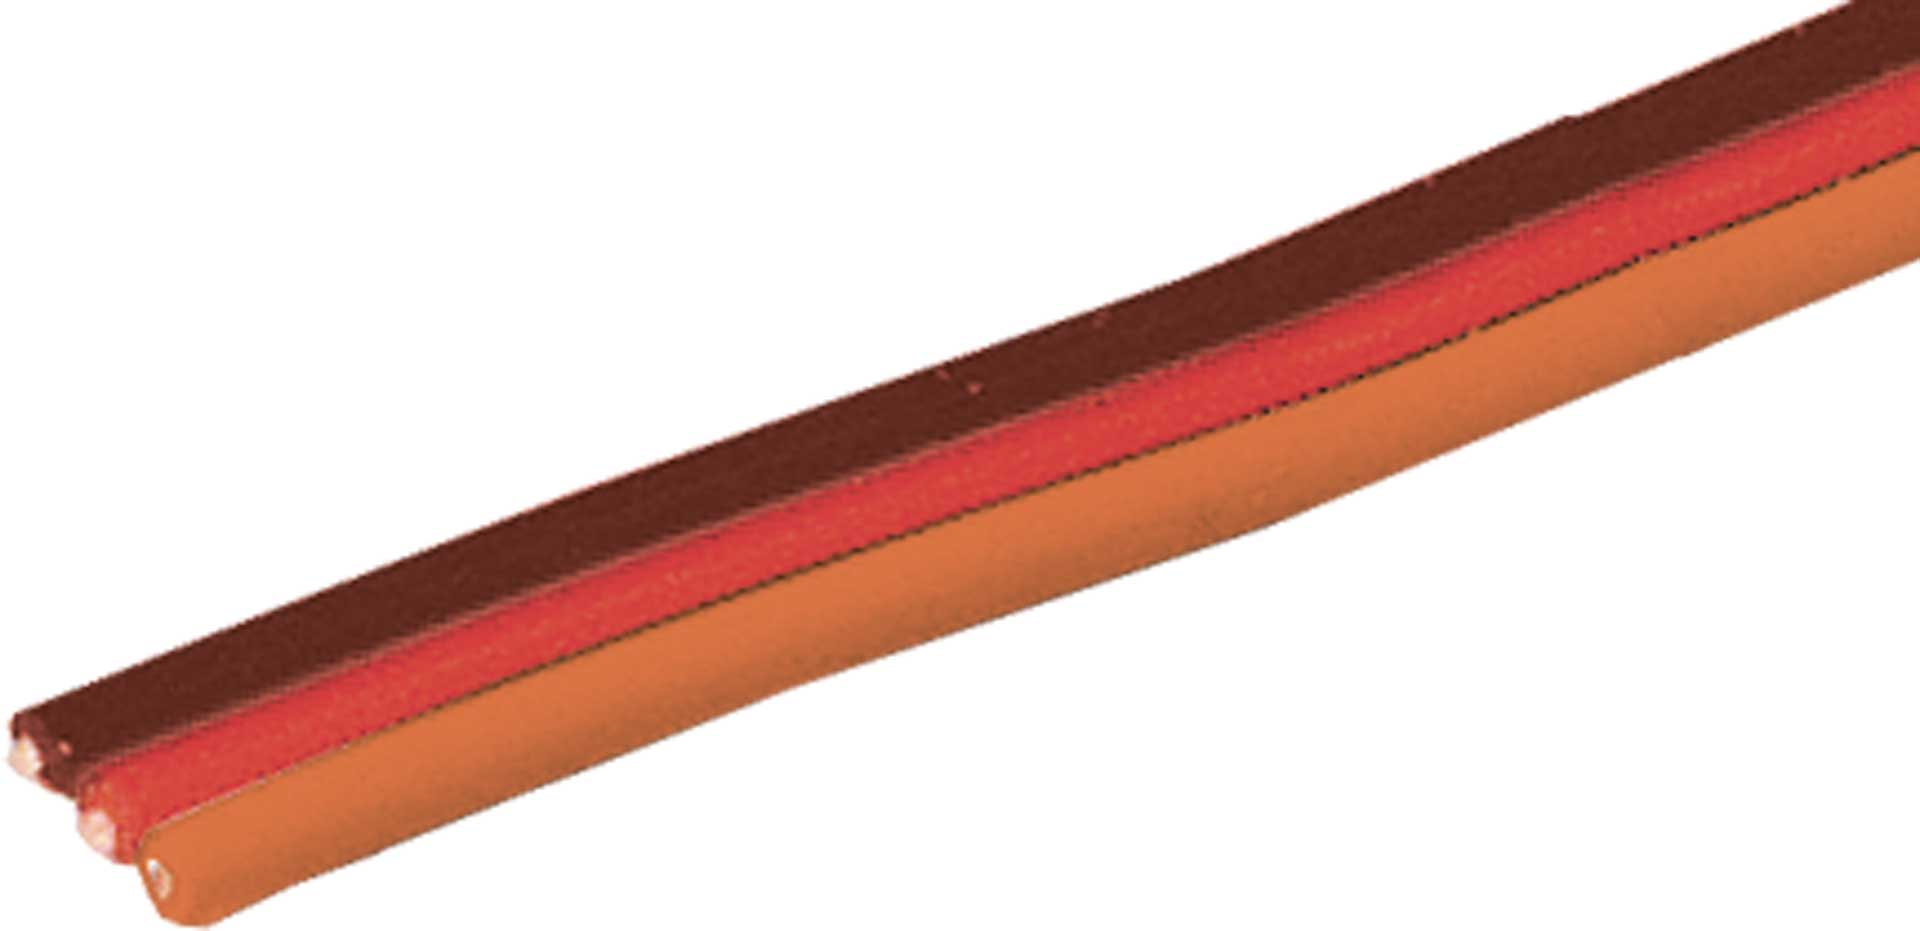 Robbe Modellsport Servokabel Graupner/JR/Uni 5 Meter flach 0,5mm² (20AWG) PVC Meterware